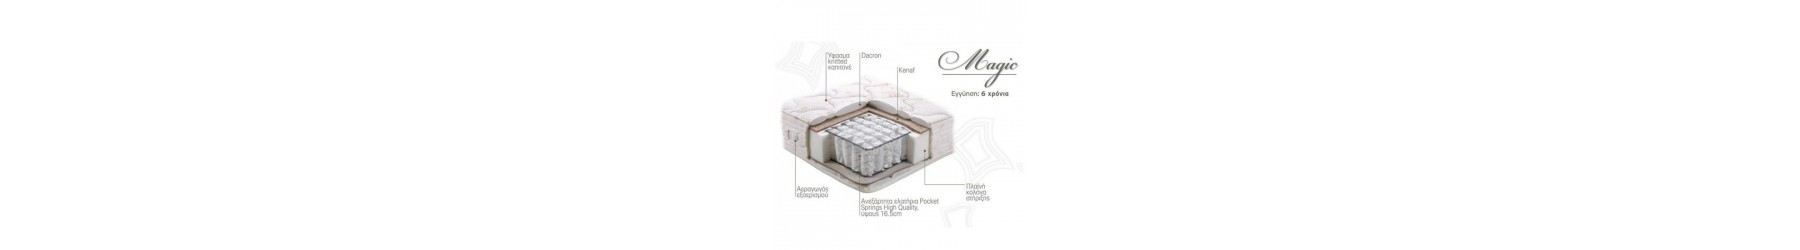 MAGIC Στρώματα με ανατομικό και ορθοπεδικό σχεδιασμό